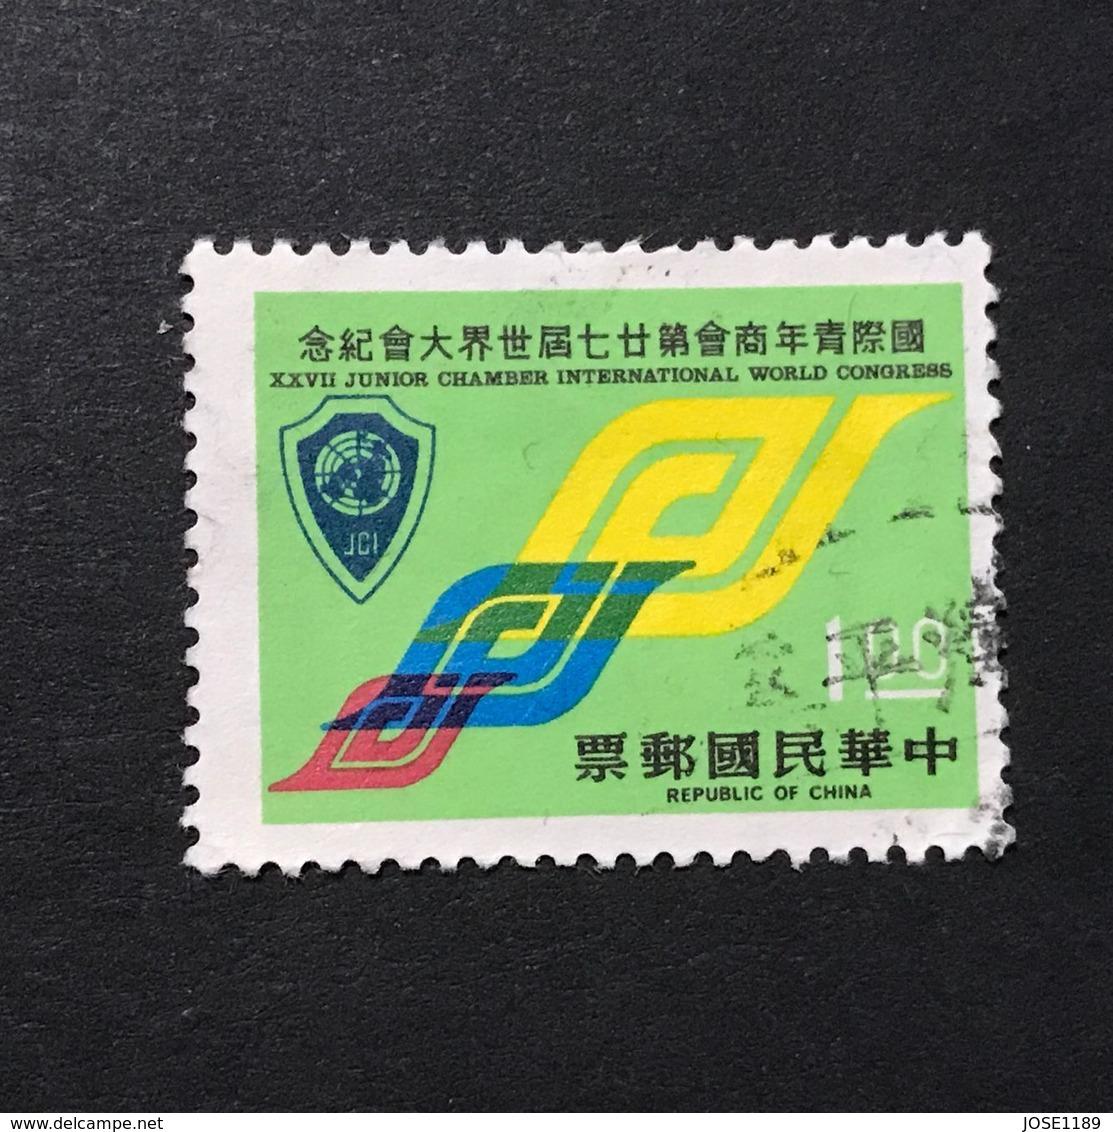 ◆◆◆Taiwán (Formosa)  1972   27th Junior Chamber International (JCI) World Congress, Taipei,   $1   USED   AA2307 - 1945-... República De China